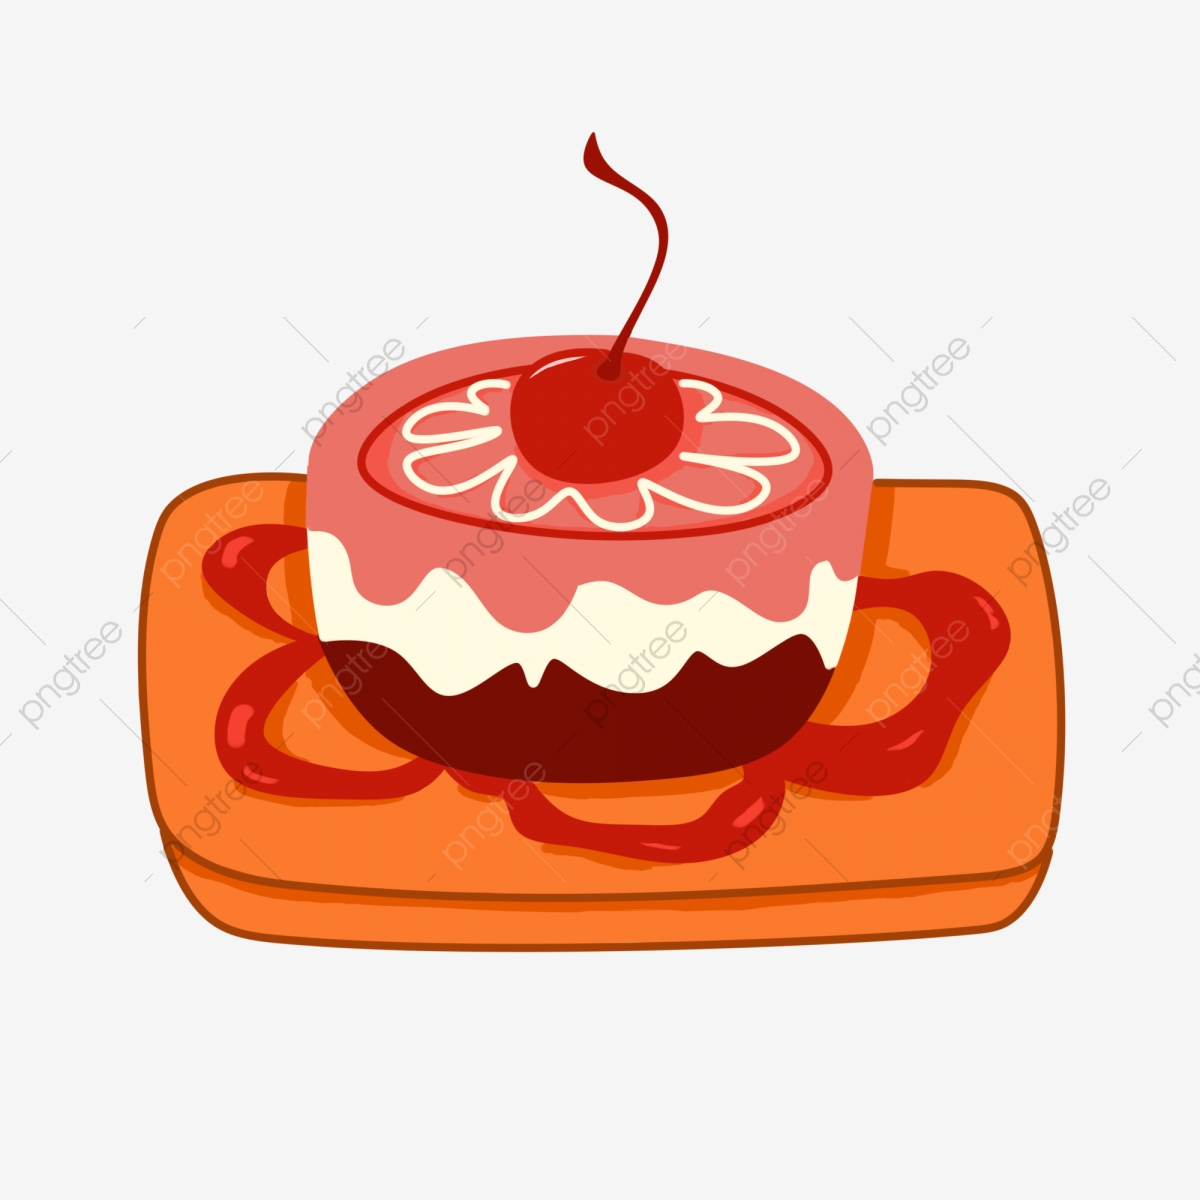 Dessert cake small cup. Desserts clipart snack